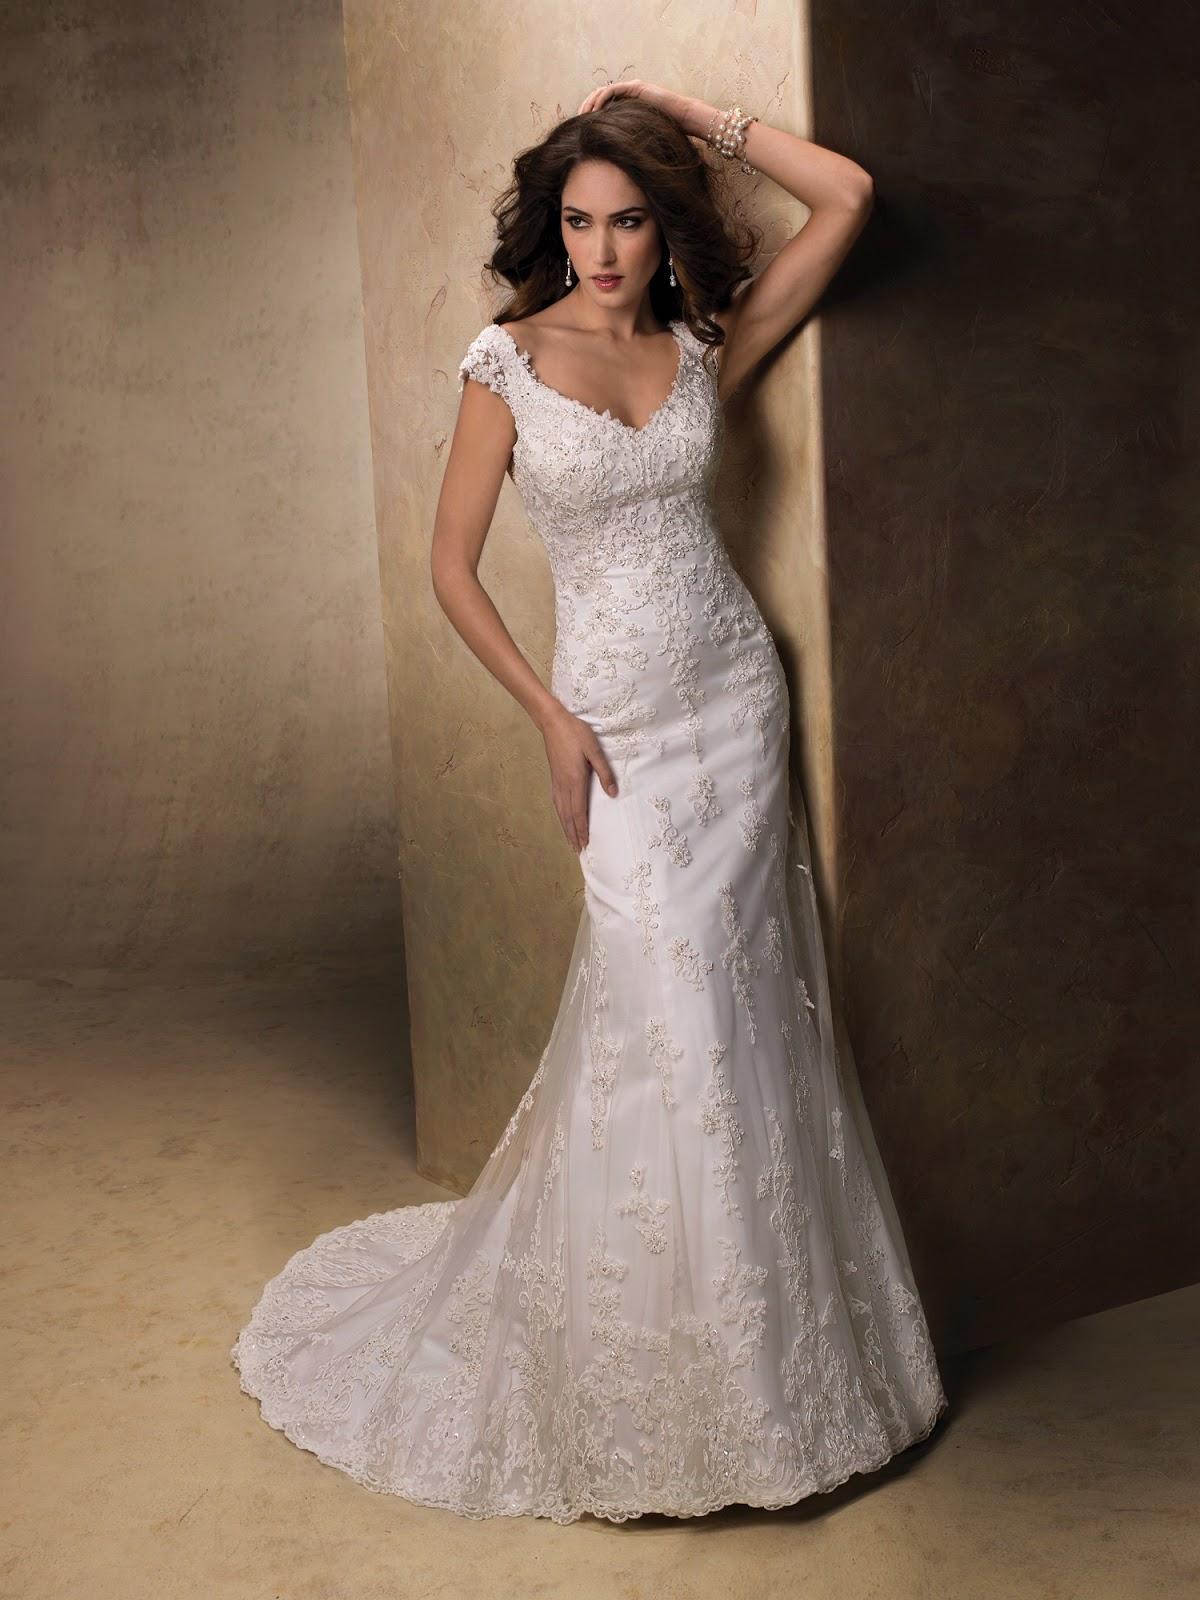 Wedding Gowns For Under 1000 Pemerintah Kota Ambon